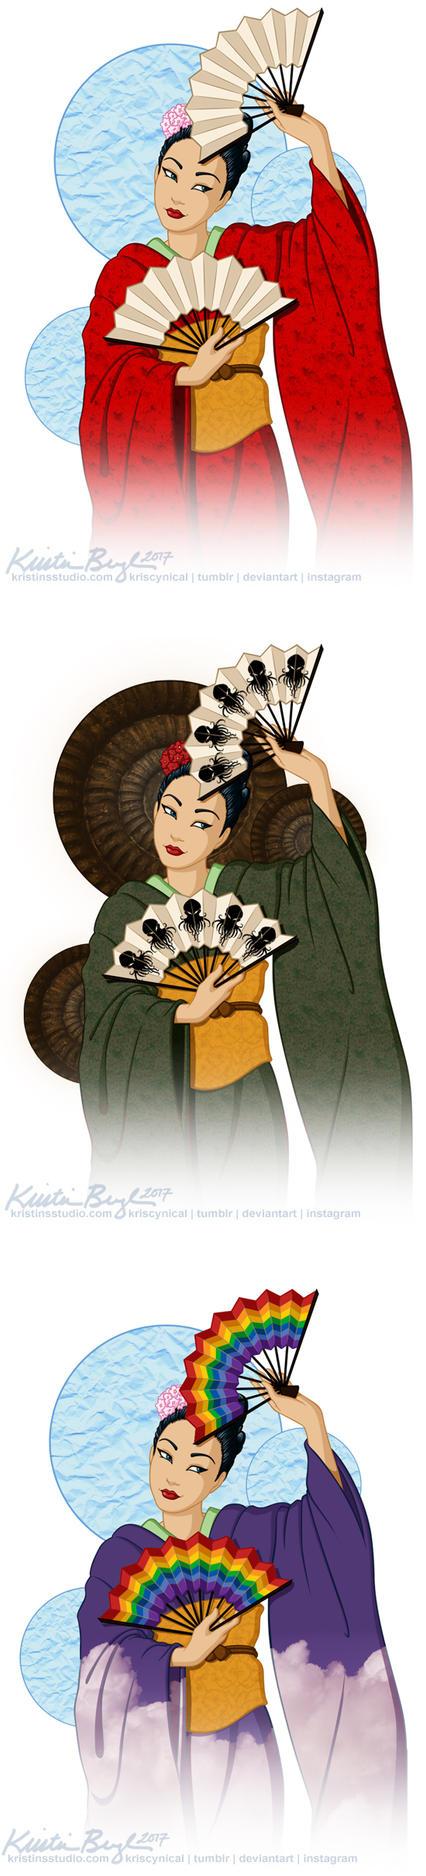 A-Kon 26 Geisha, 2015 by KrisCynical